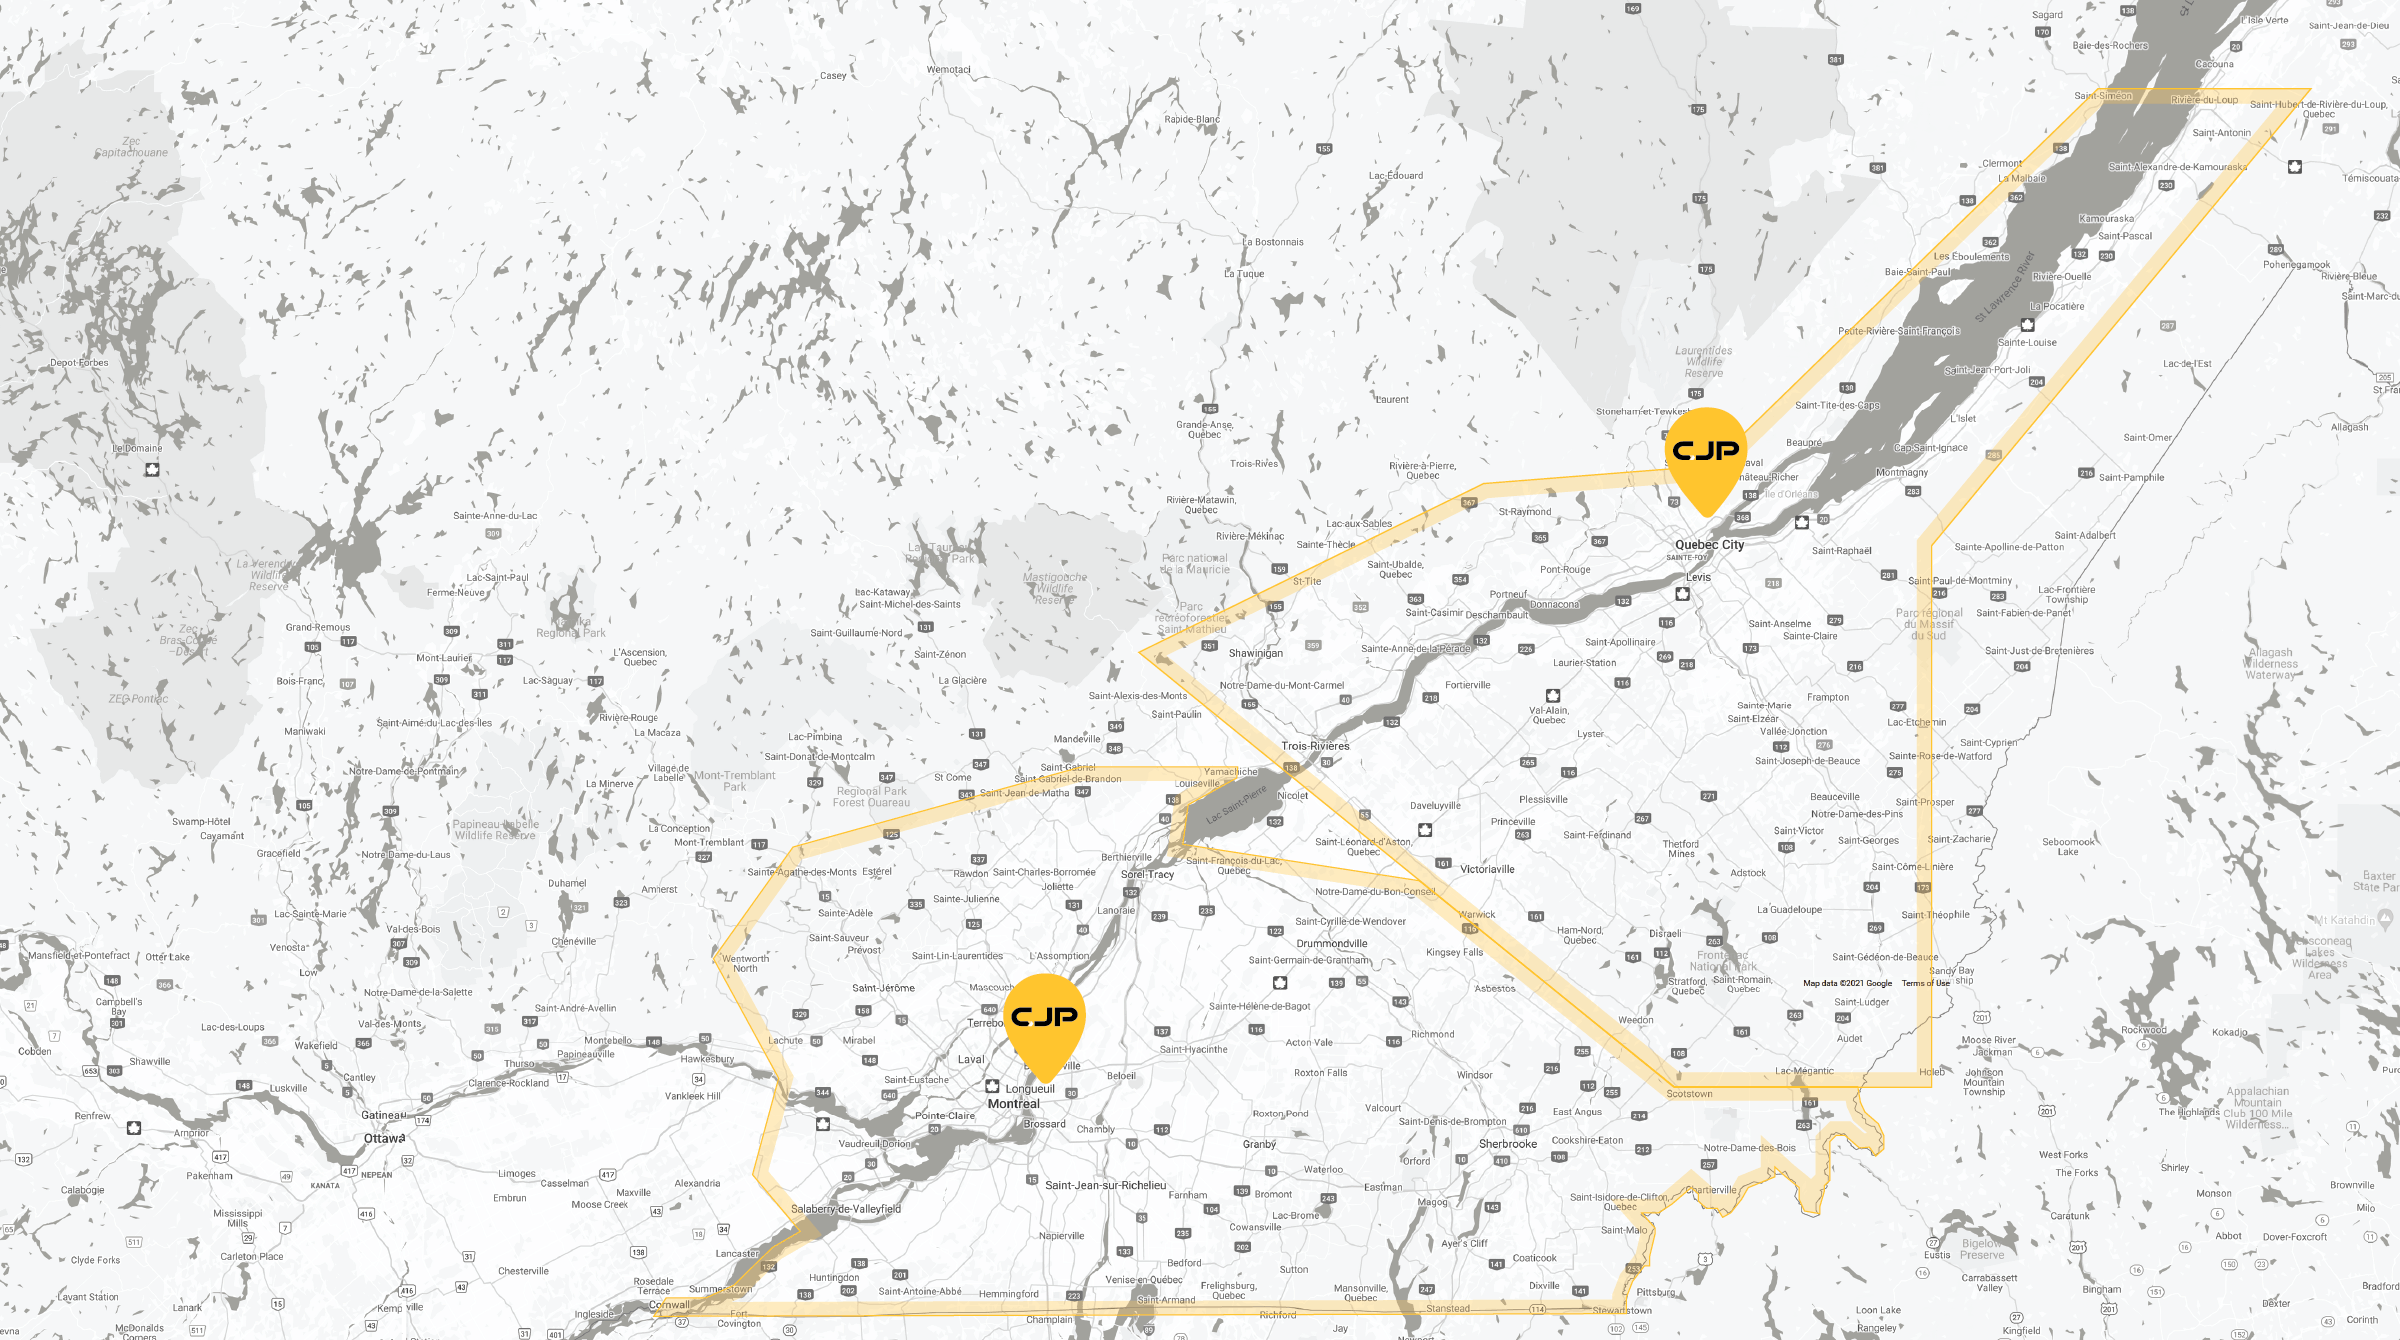 CJP Delivery Zones